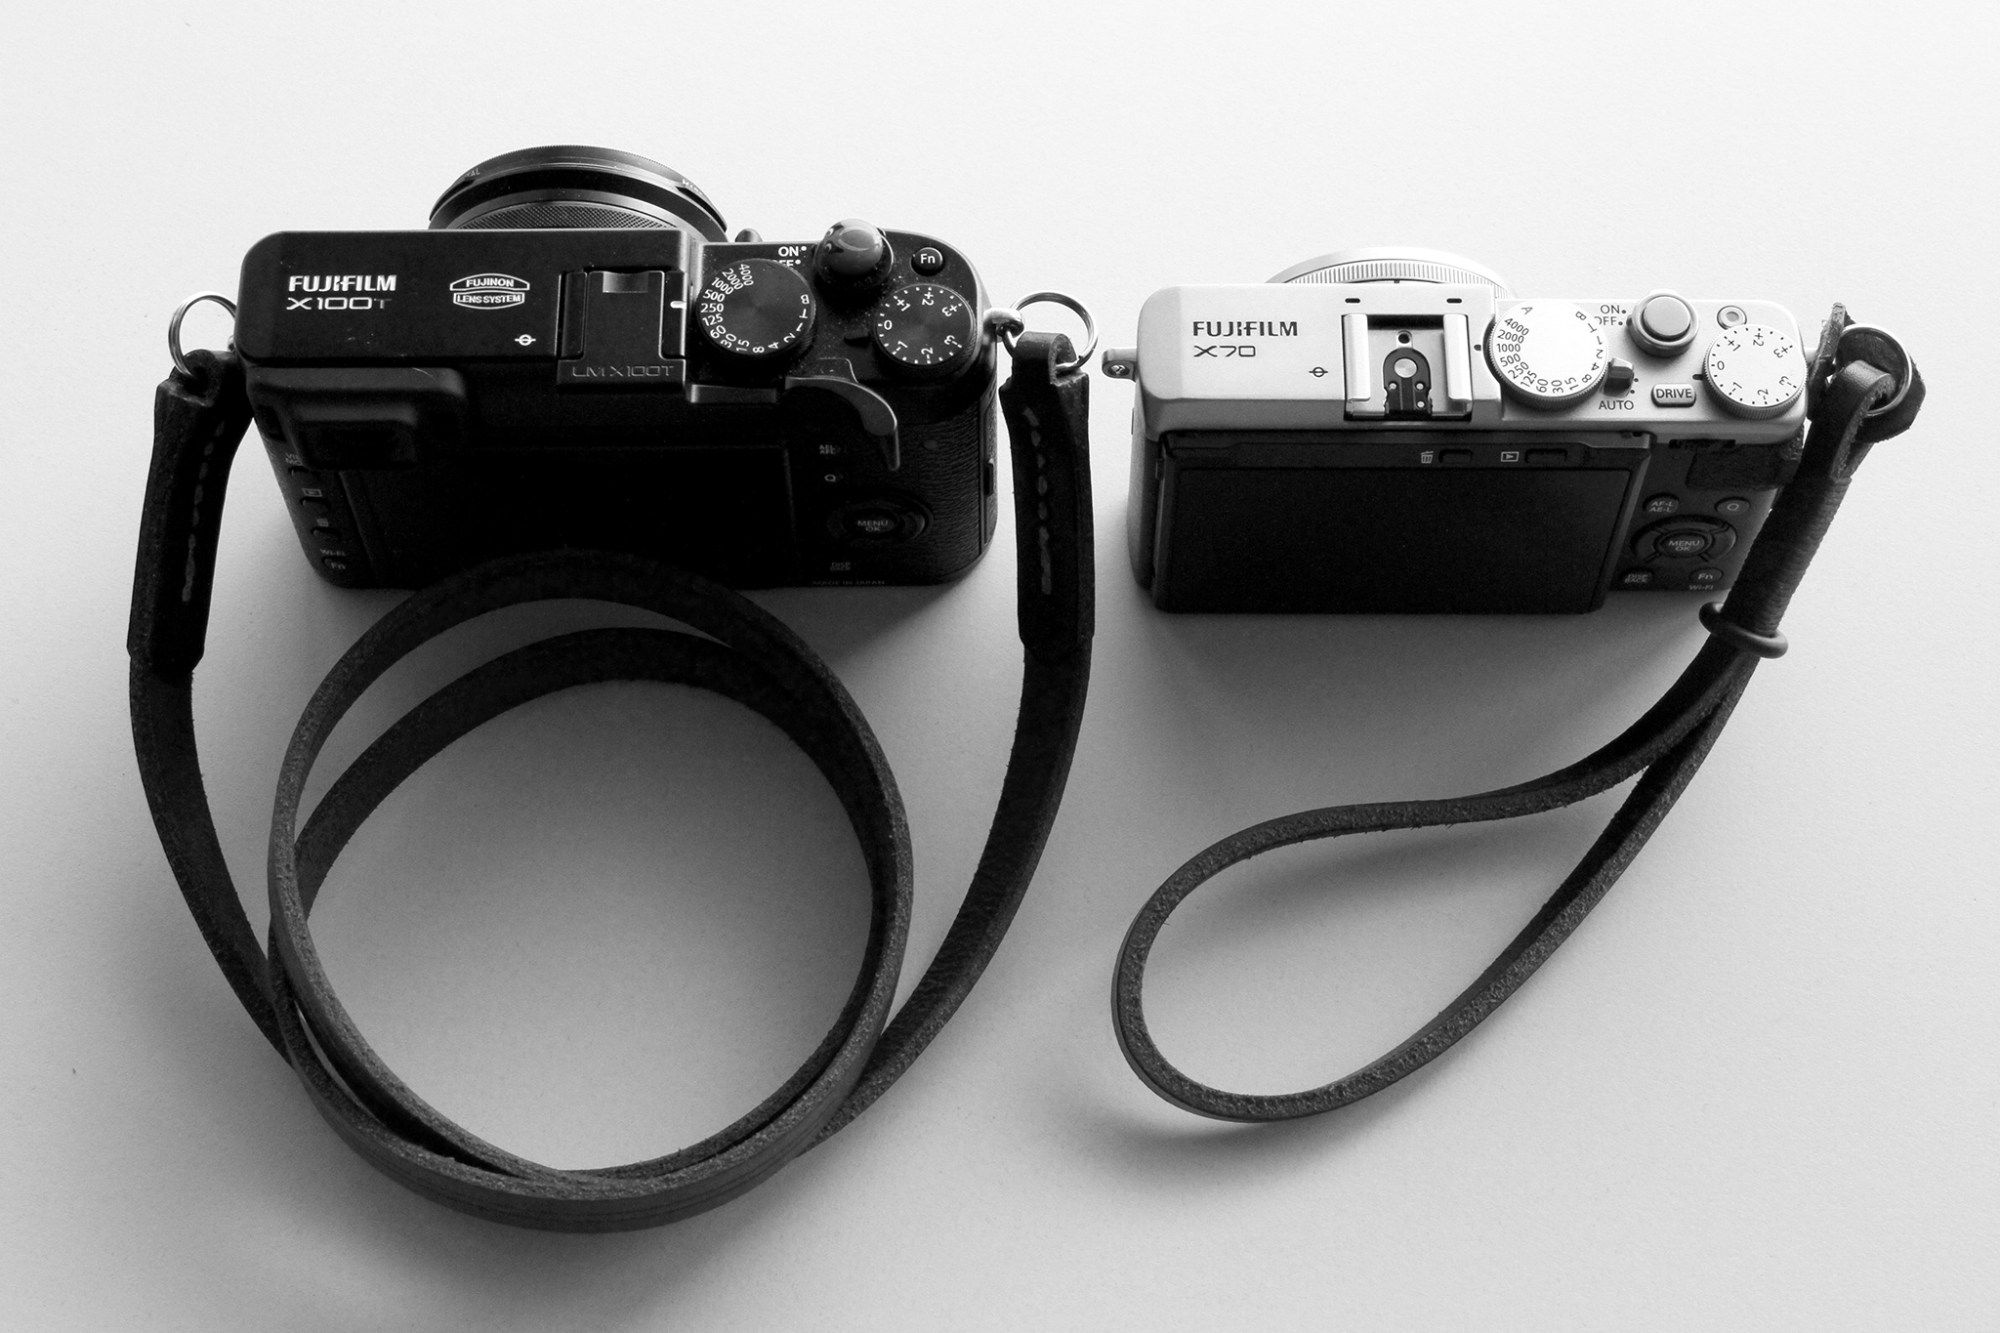 Photography Fuji X70 Street Review